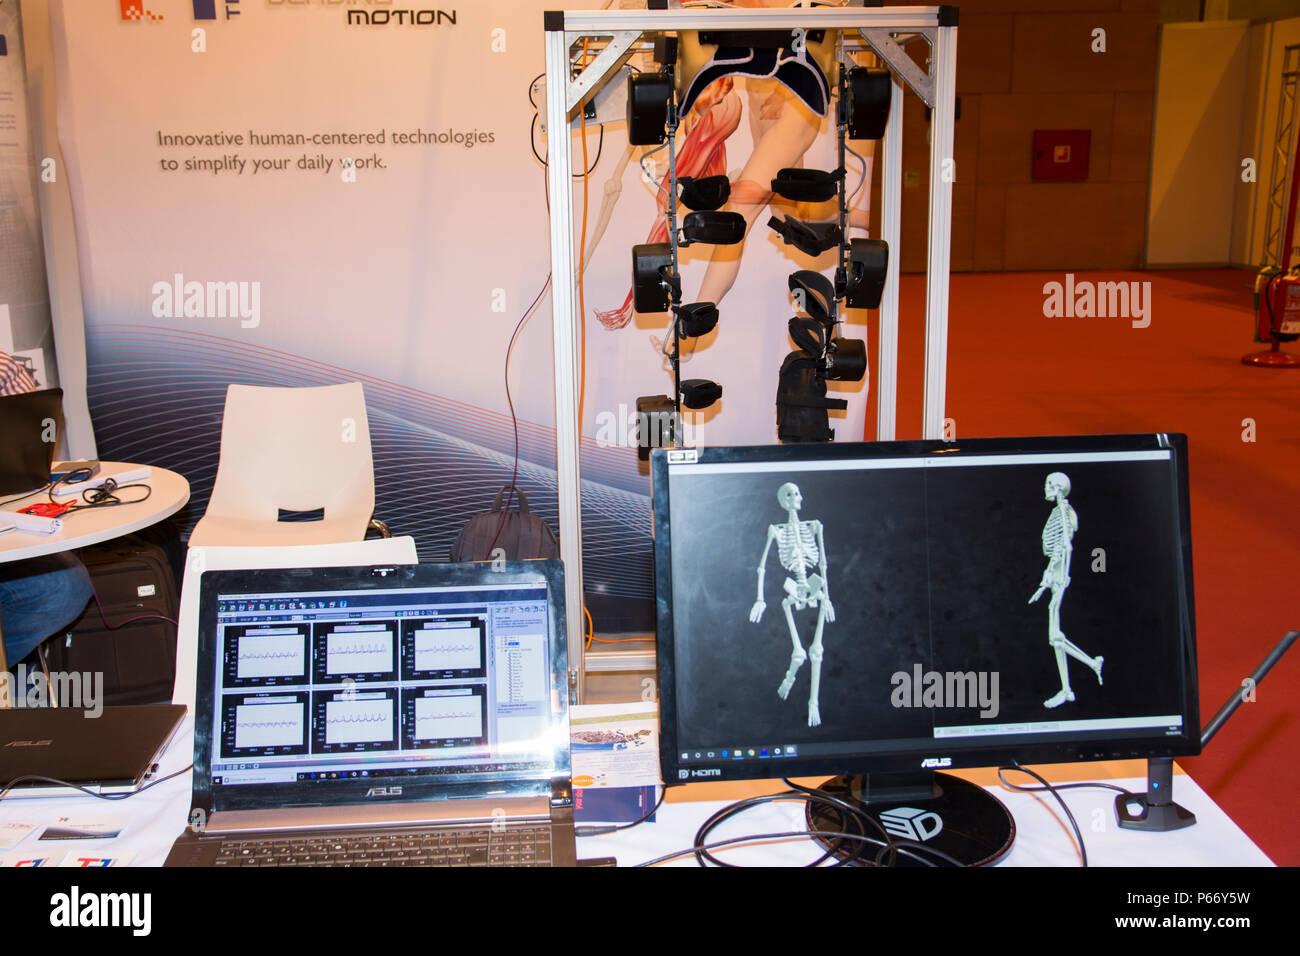 Tech MCS Software mediante captura de movimientos para la empresa Technaid. GR-EX (Cumbre Mundial Expo del robot). Imagen De Stock